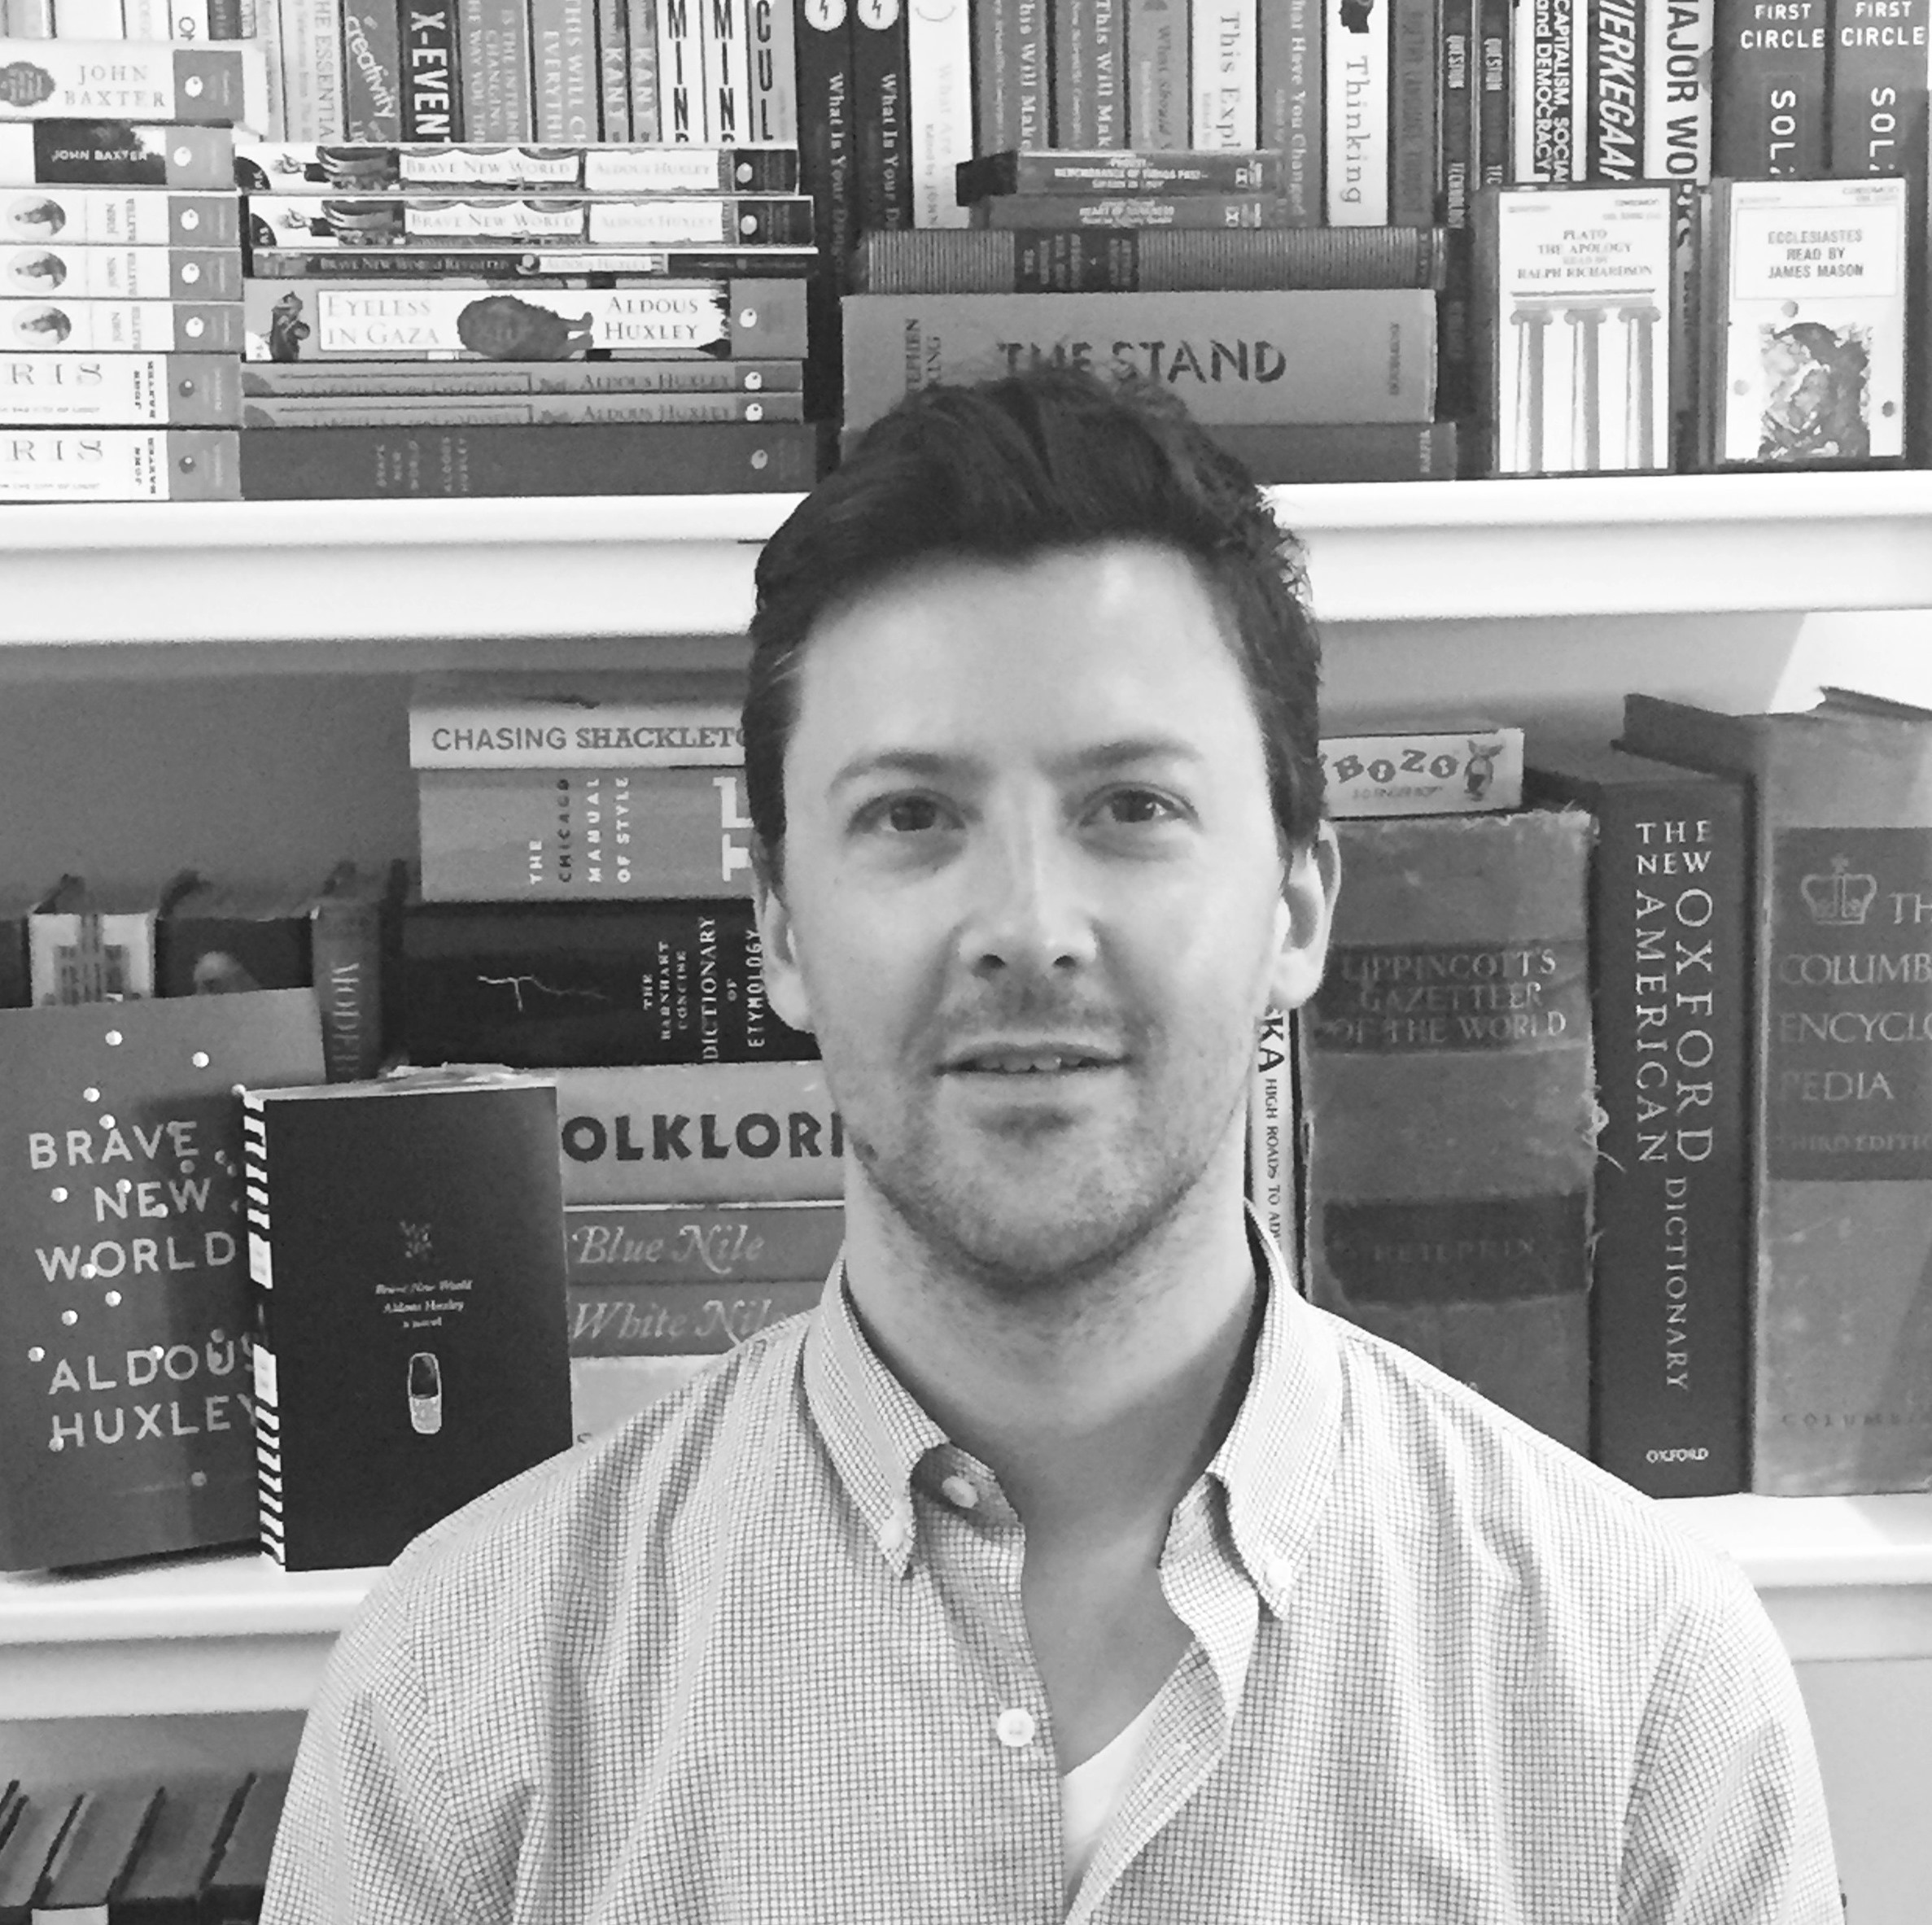 Q&A: PETER HUBBARD, EXECUTIVE EDITOR AT WILLIAM MORROW